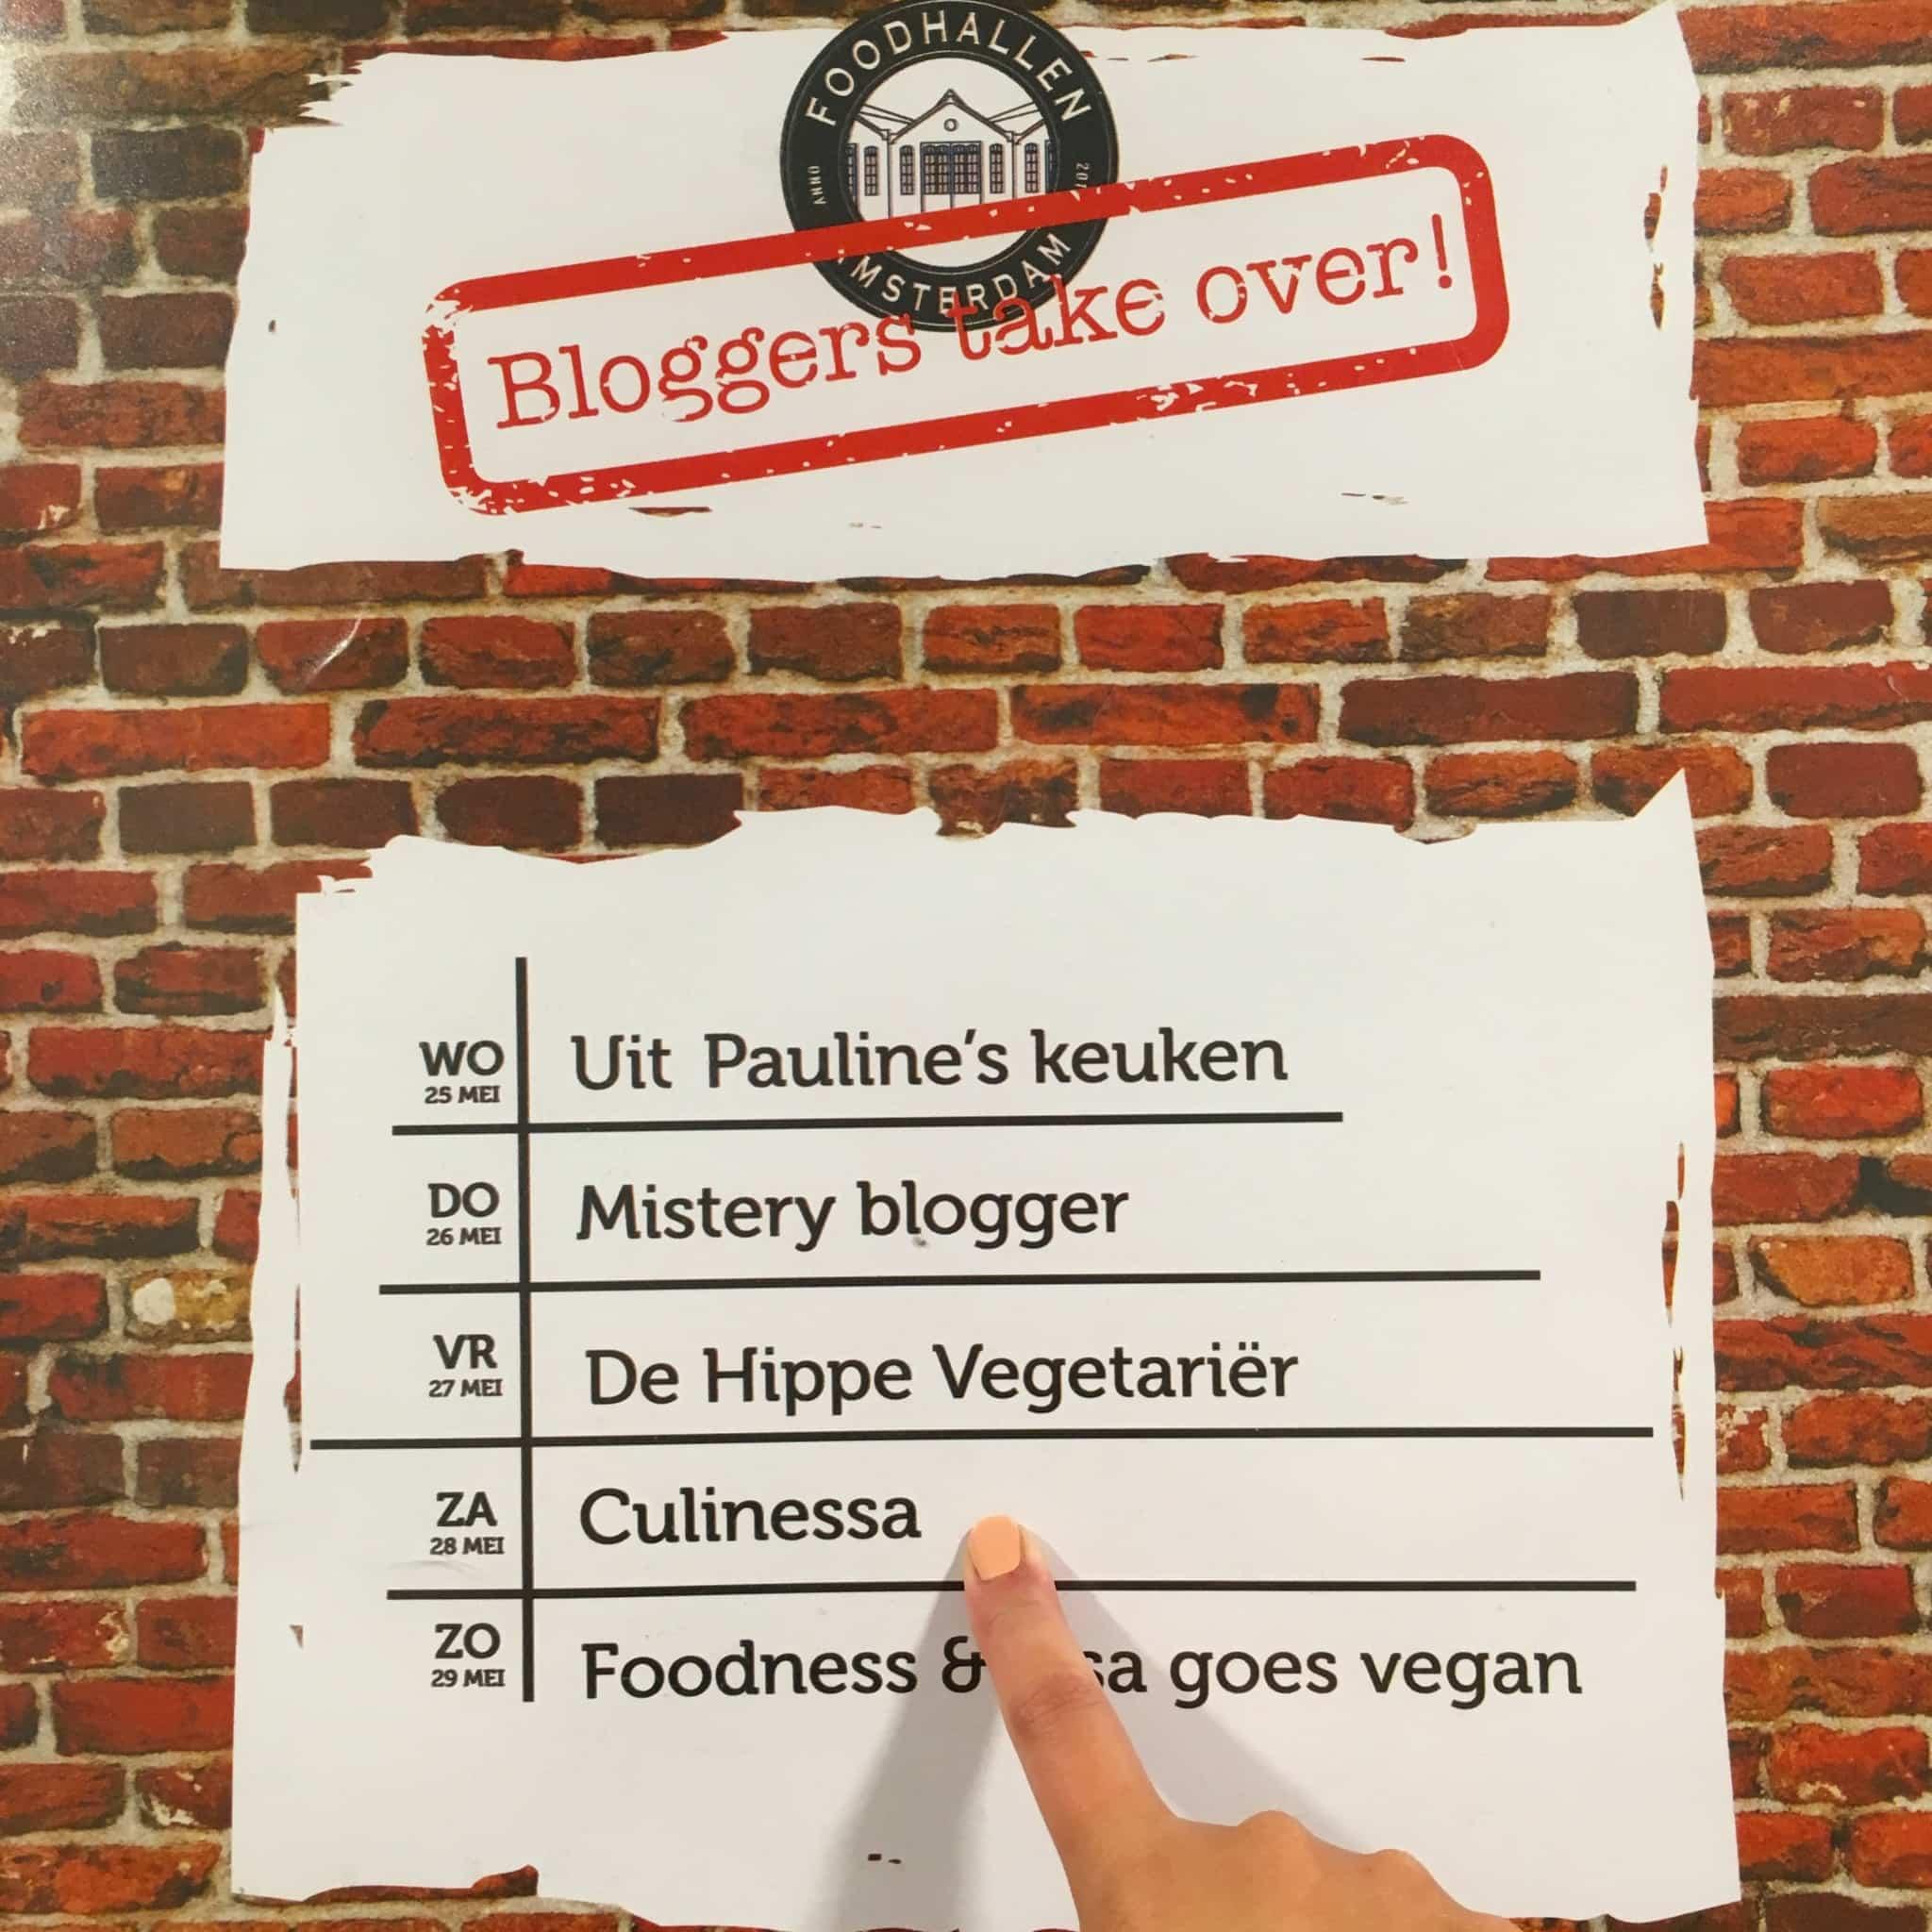 image5 - De Foodhallen Blogger Takeover - mijn ervaring